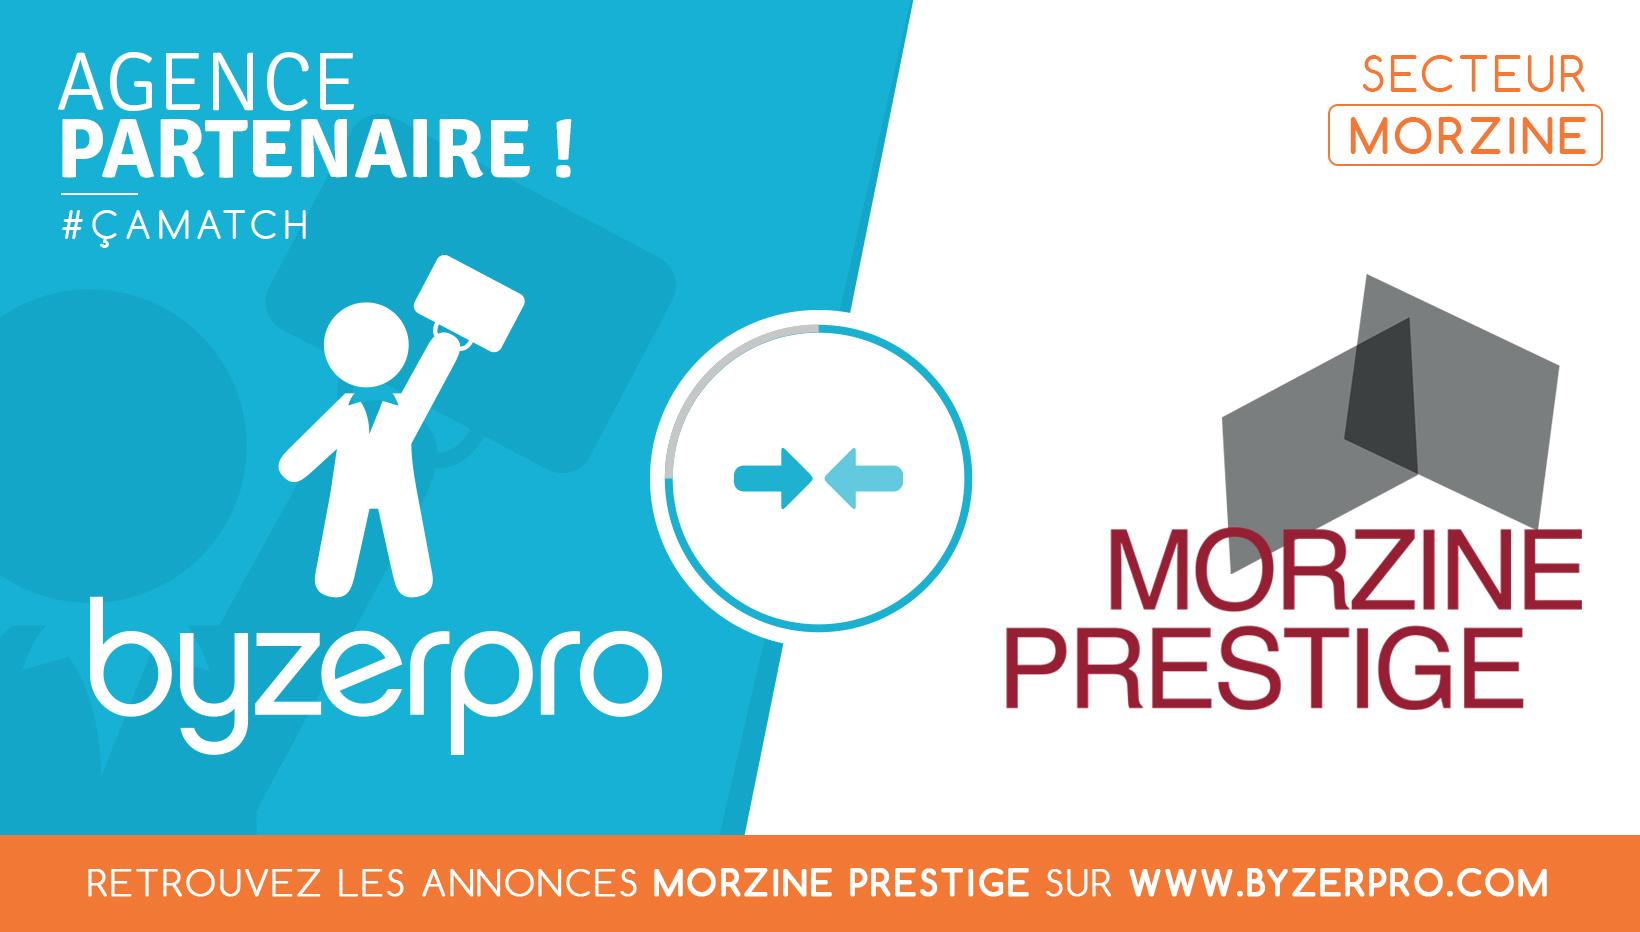 Morzine Prestige, partenaire Byzerpro.com